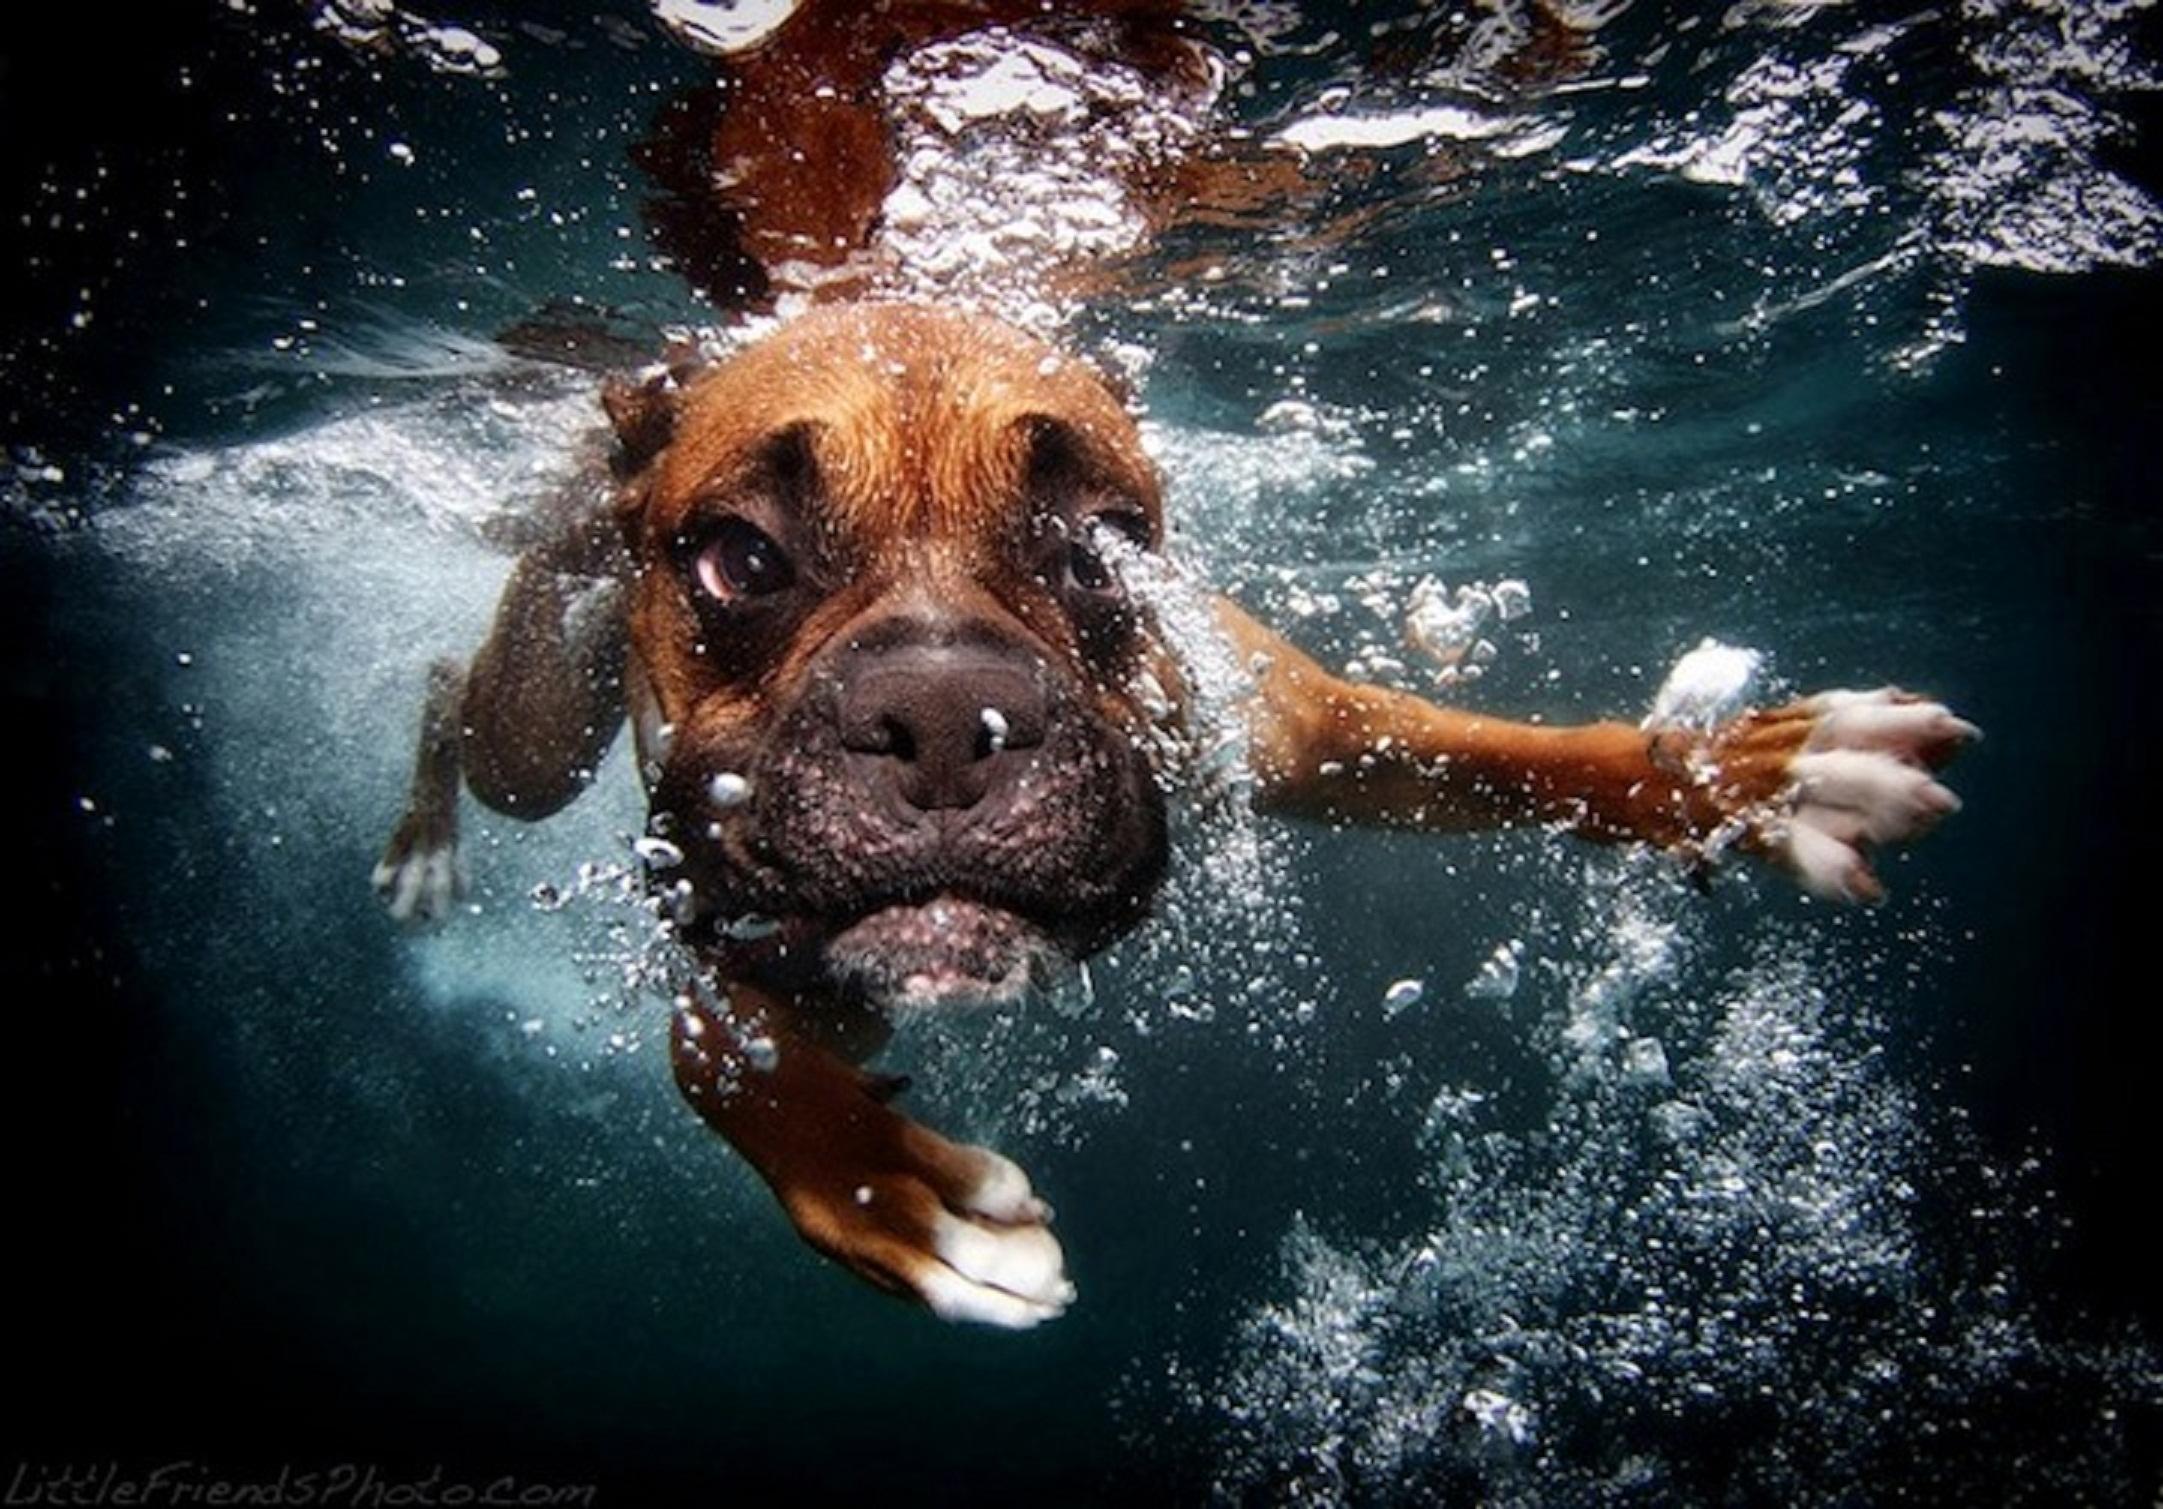 Seth Casteel's Underwater Dogs 7